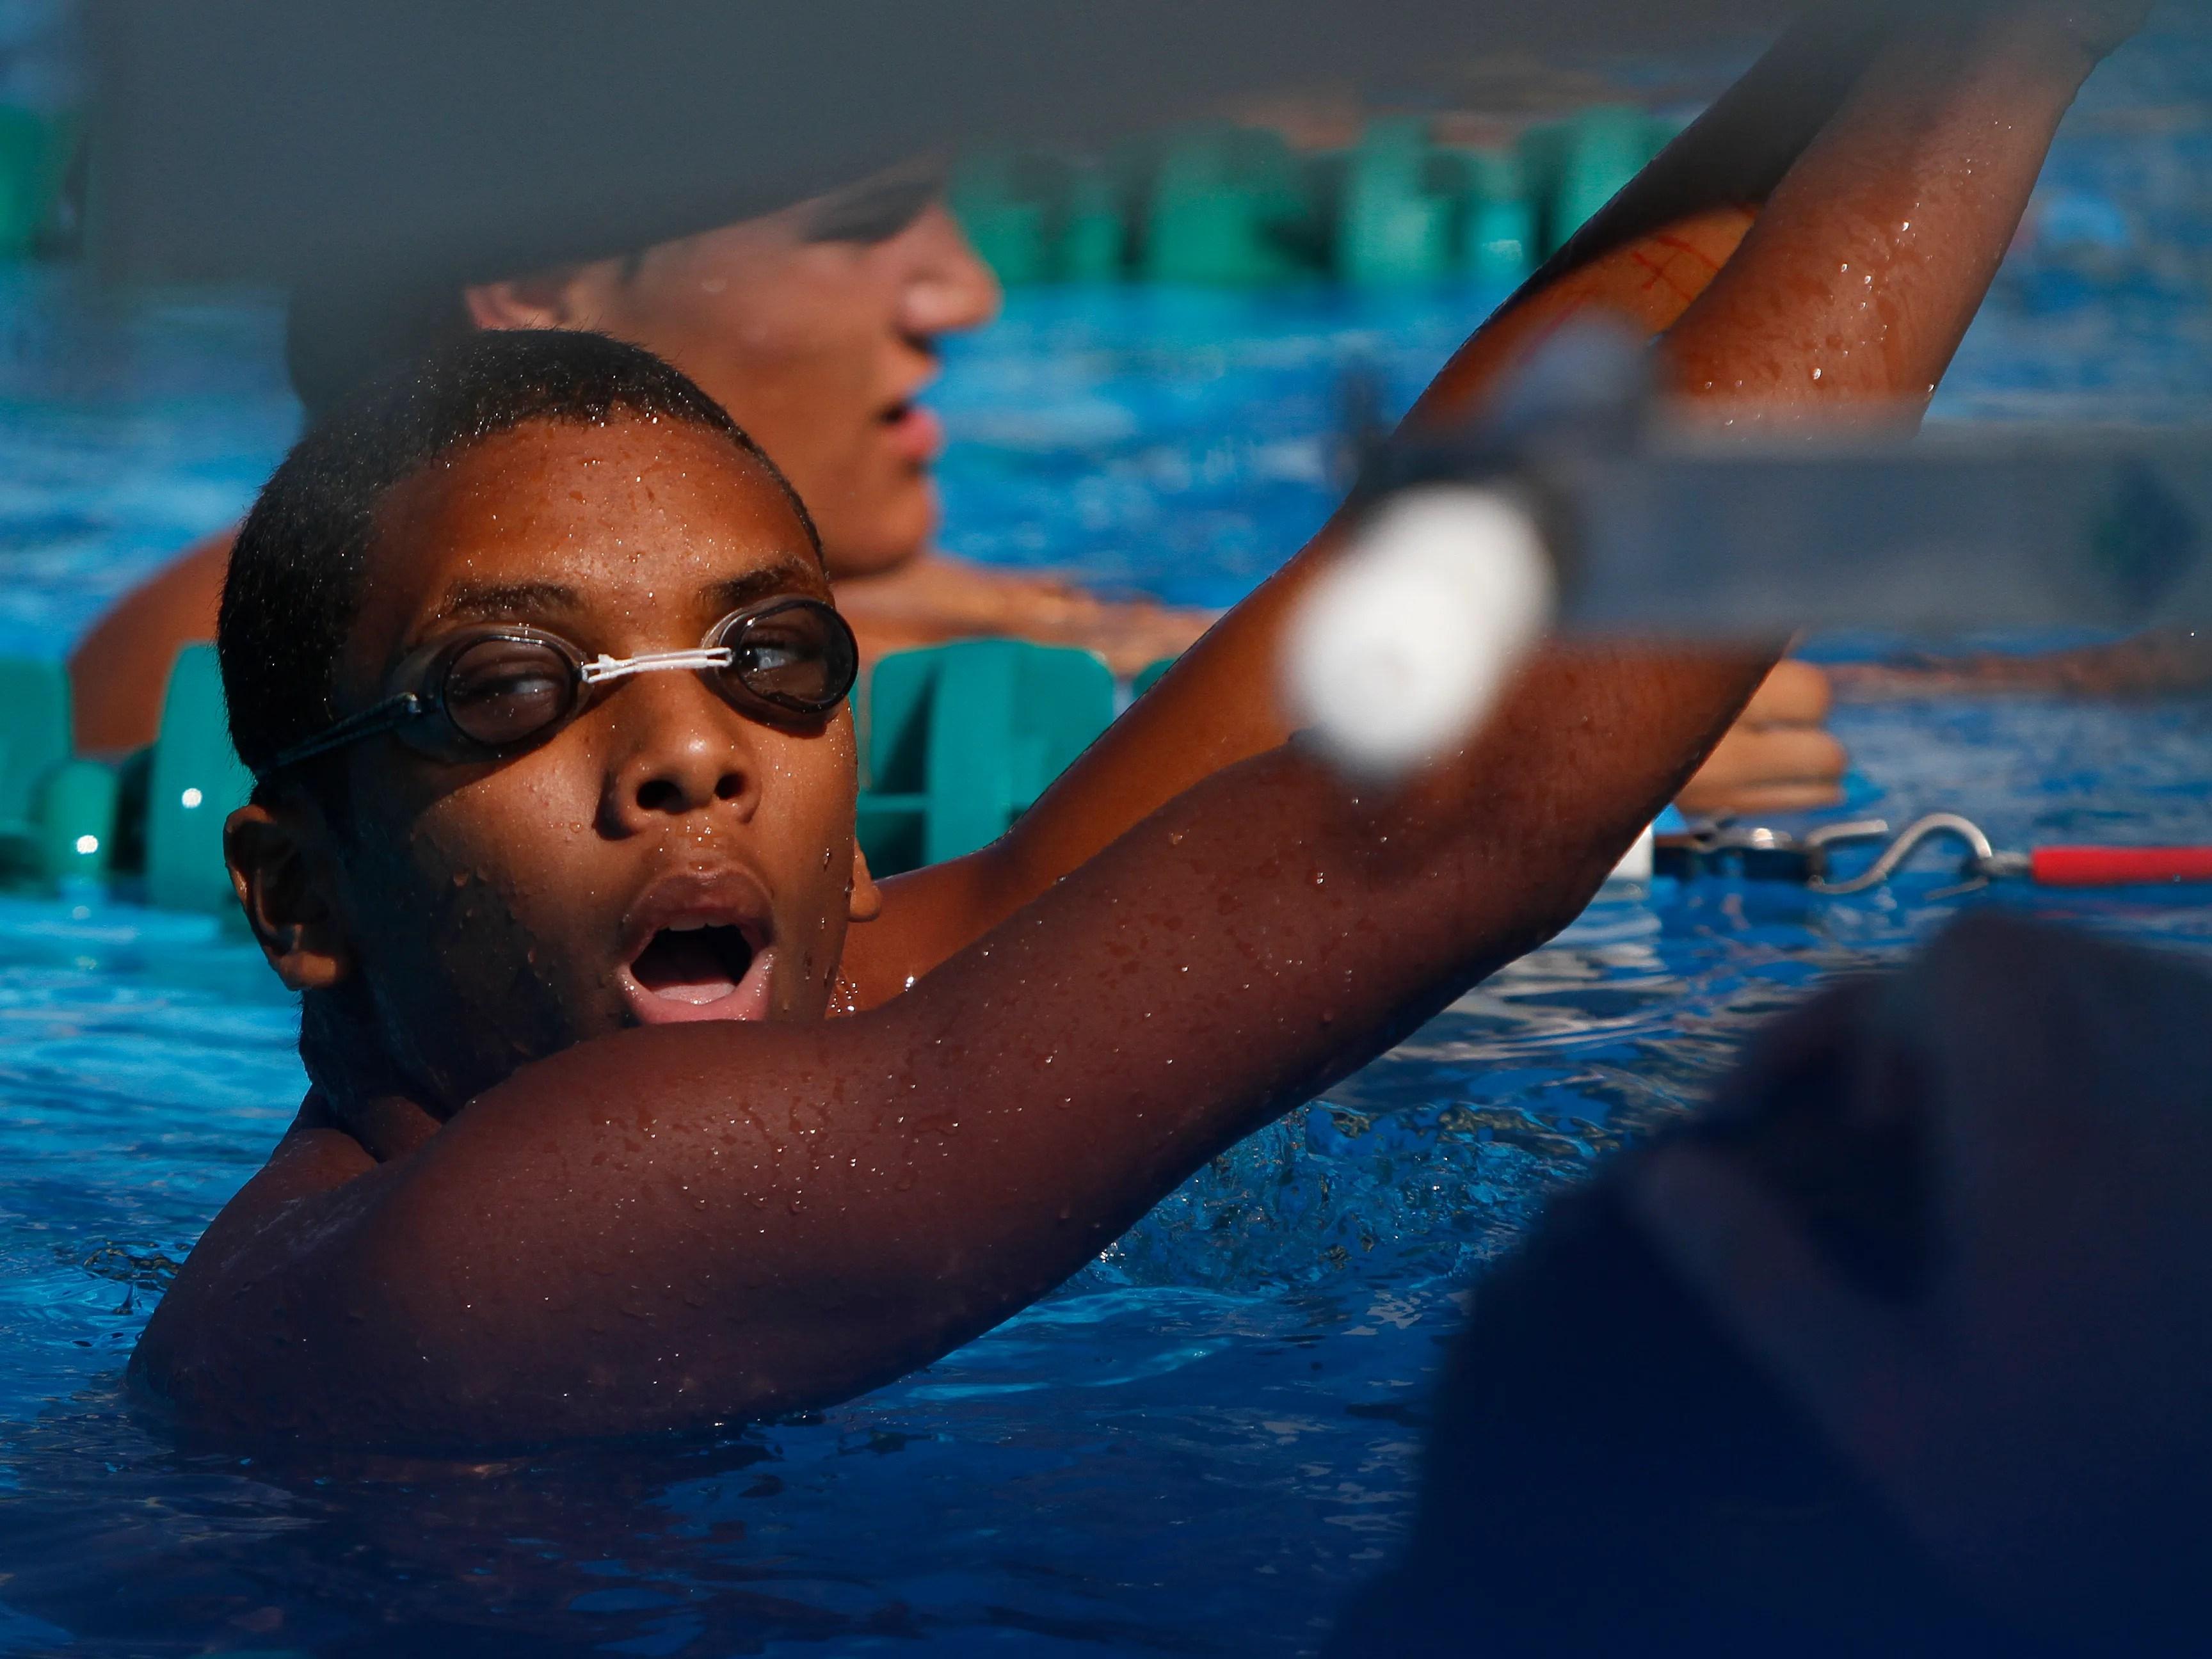 Estero cape coral swims teams have big day in pool usa - John martinez school new haven swimming pool ...